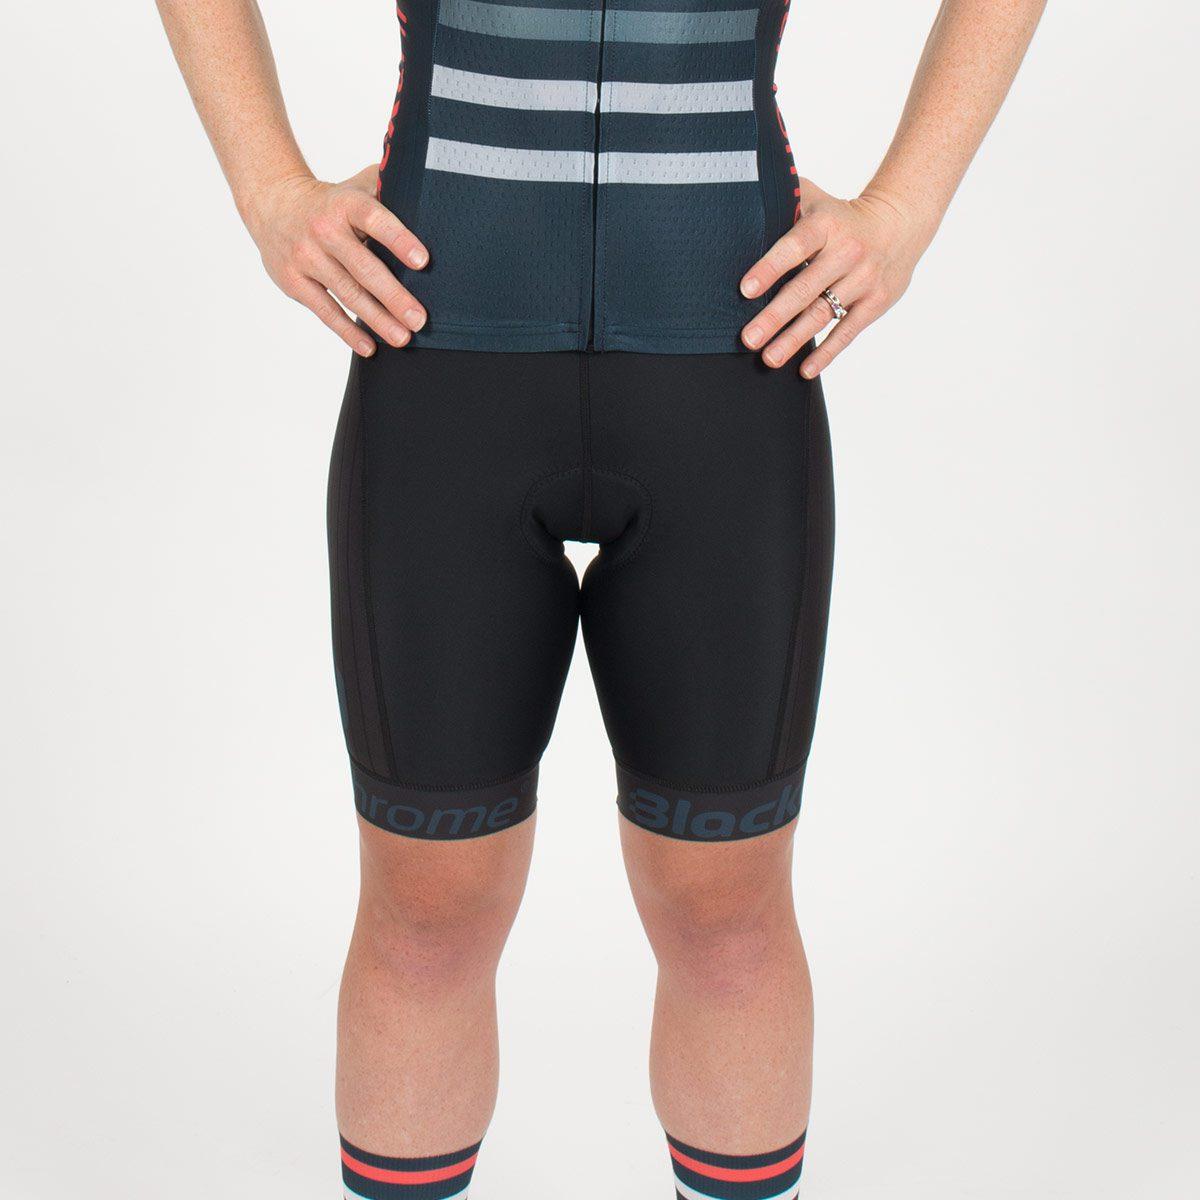 Womens Rails v2.0 Performance Fit - Cycling Bibs - VL66968 - Front 67ac6f6d8